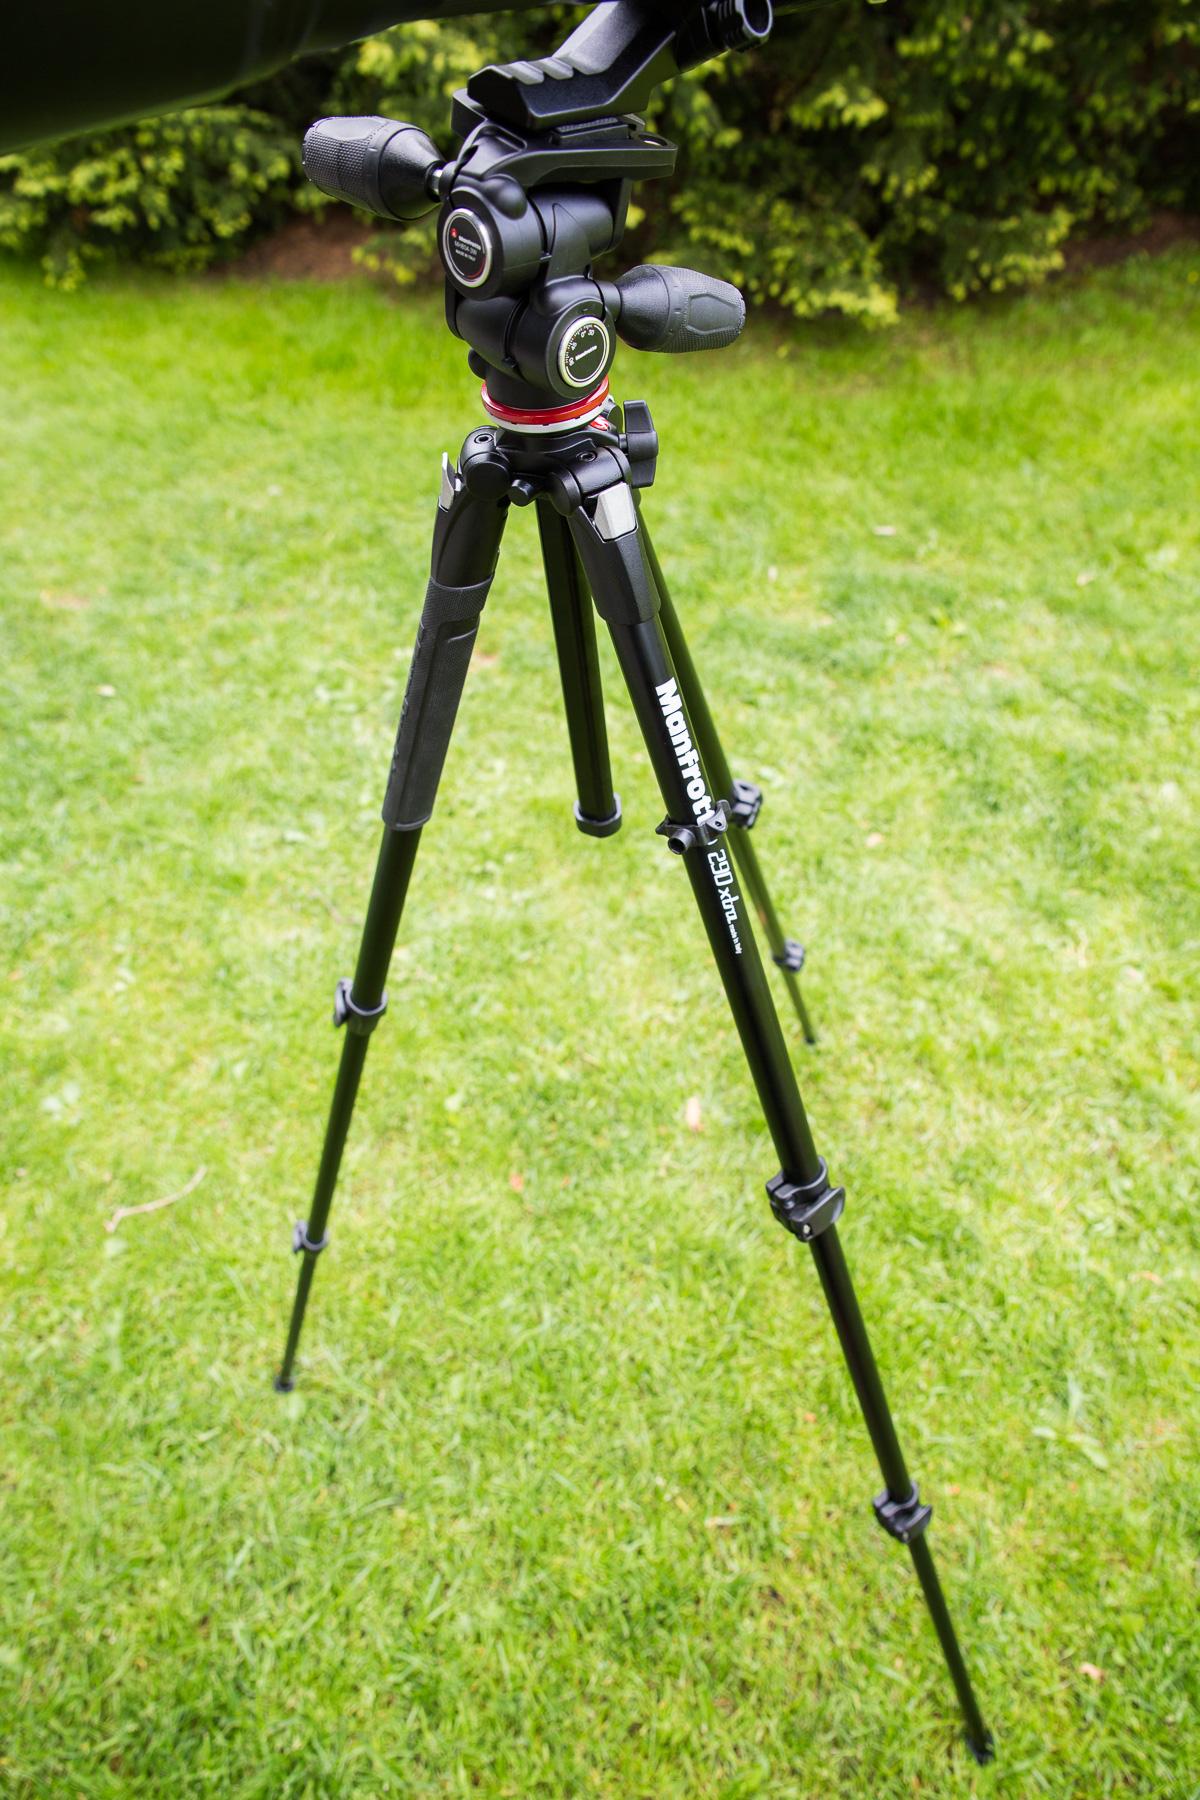 tamron-150-600mm-manfrotto-statiiv-290-xtra-3